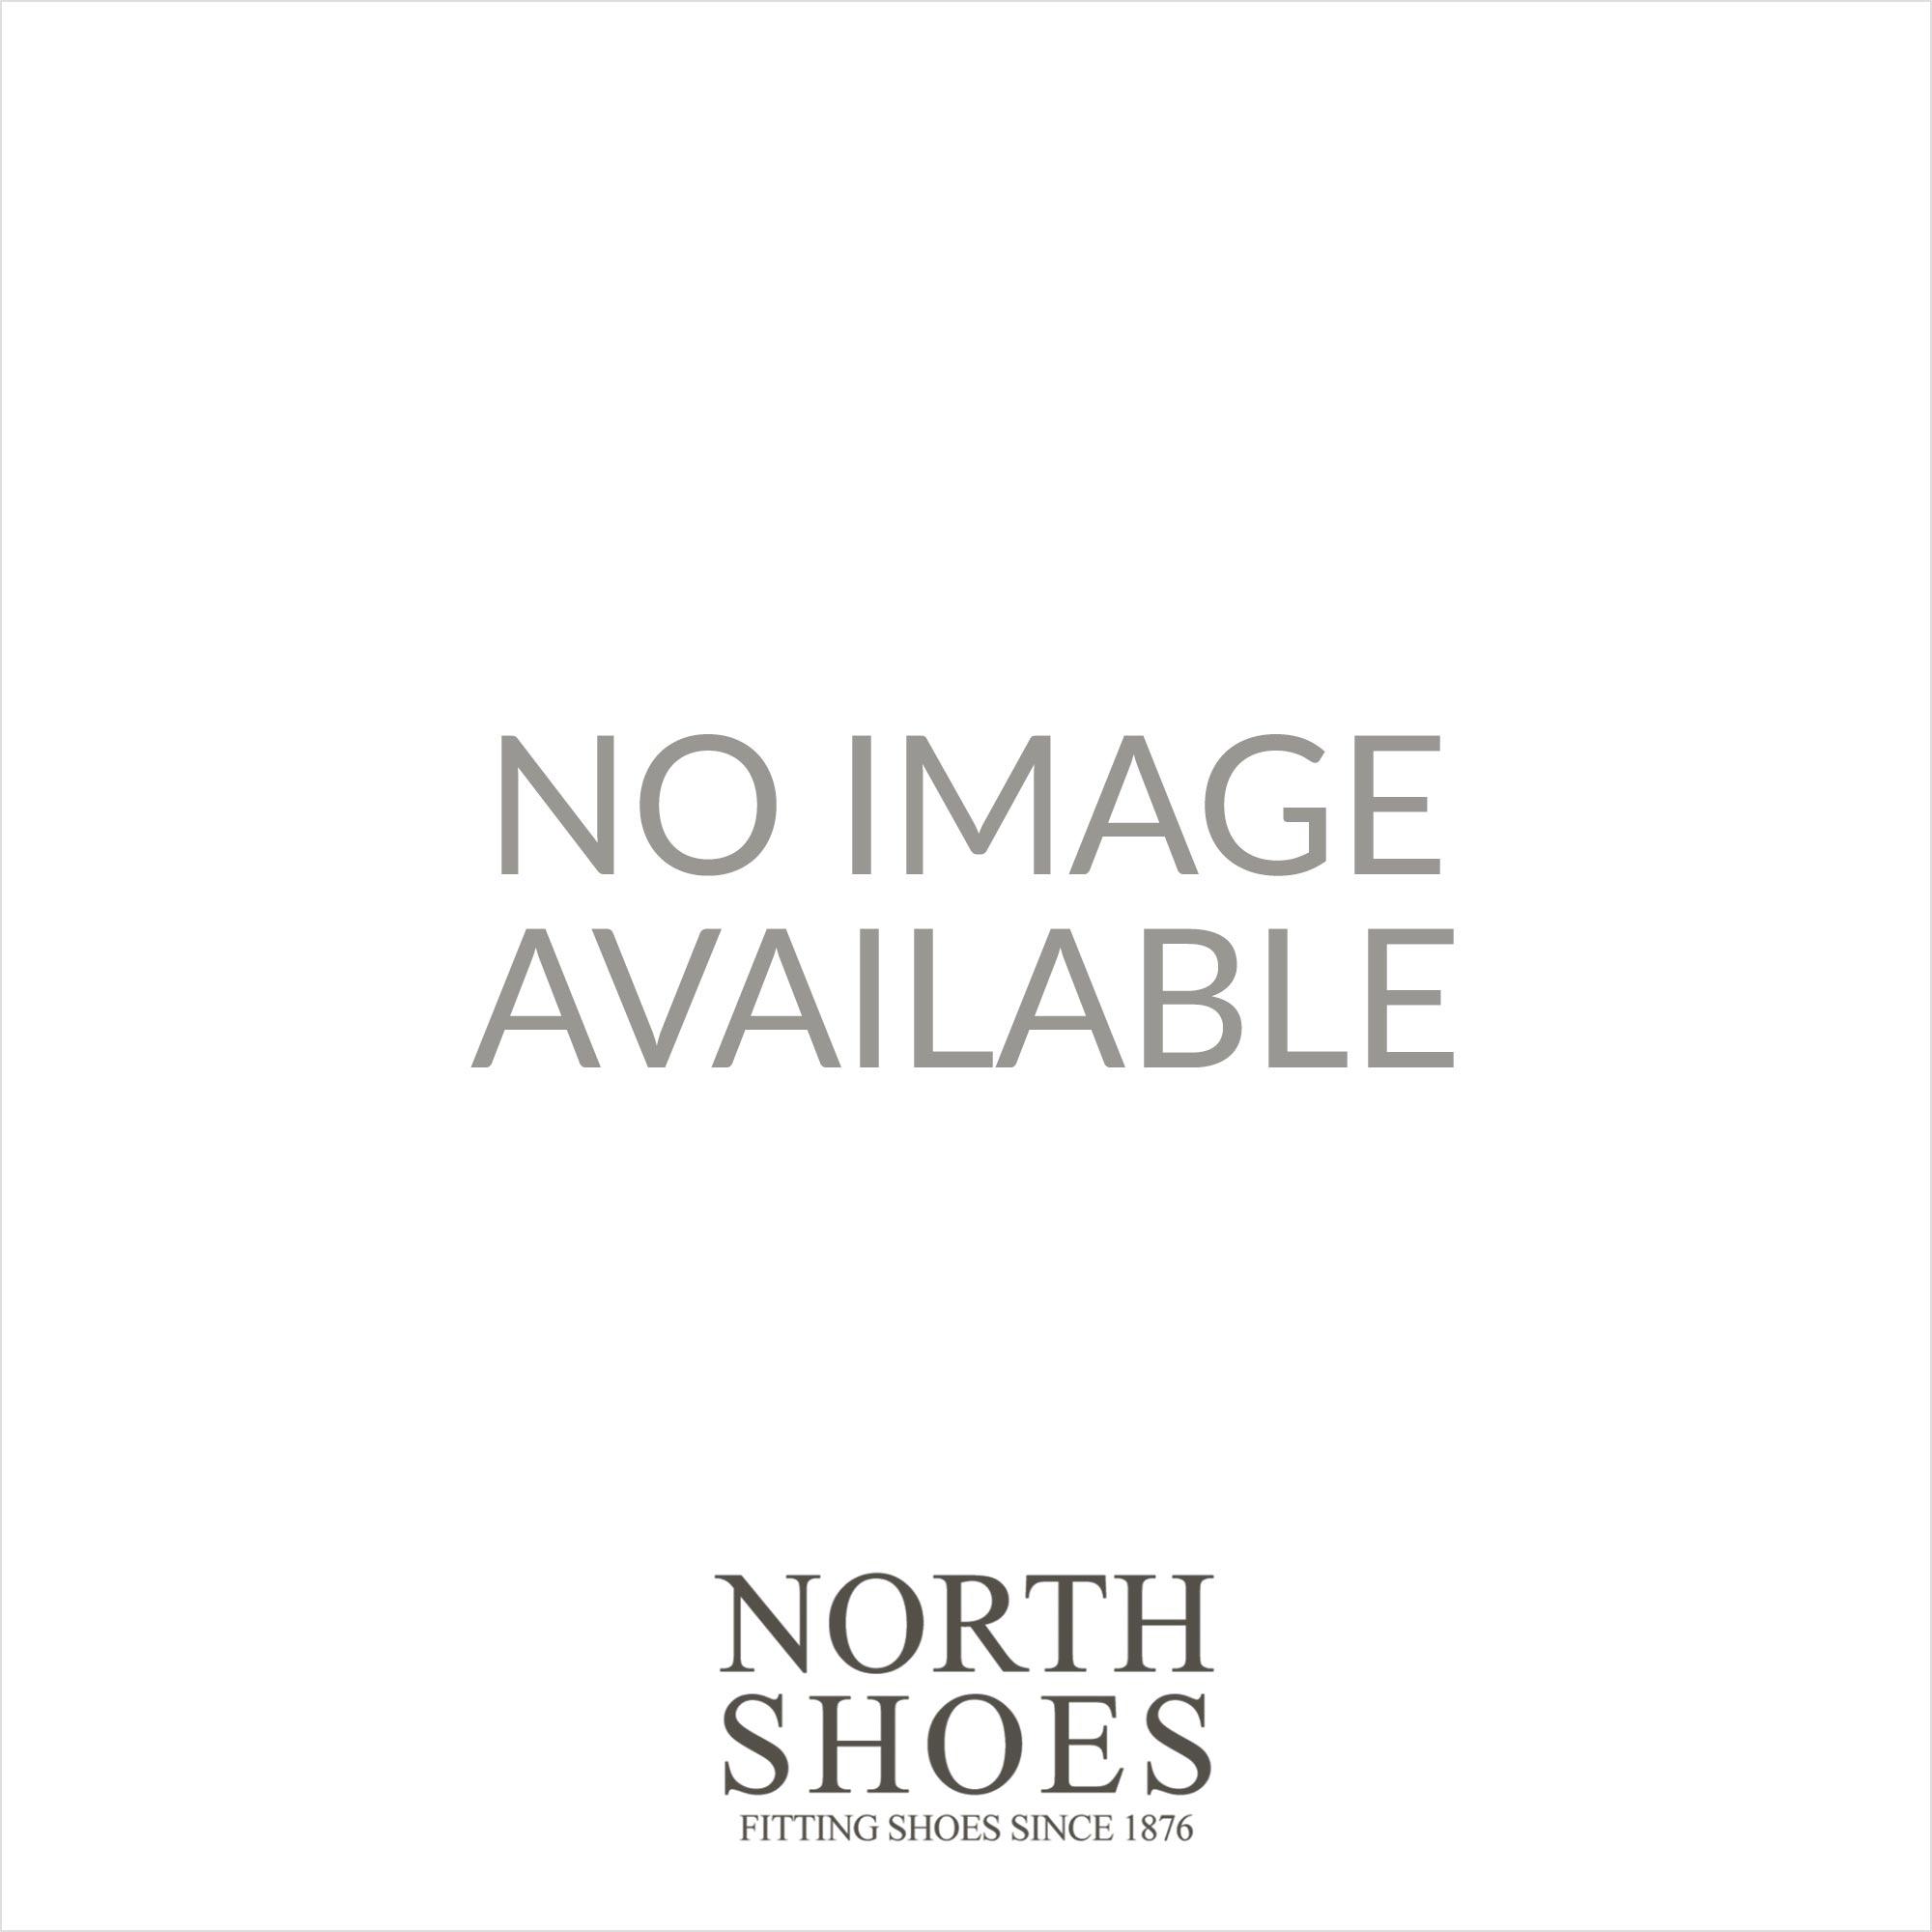 589a7a07185 Clarks Un Haven Cove Navy Nubuck Leather Womens T Bar Shoe - UK 4 ...